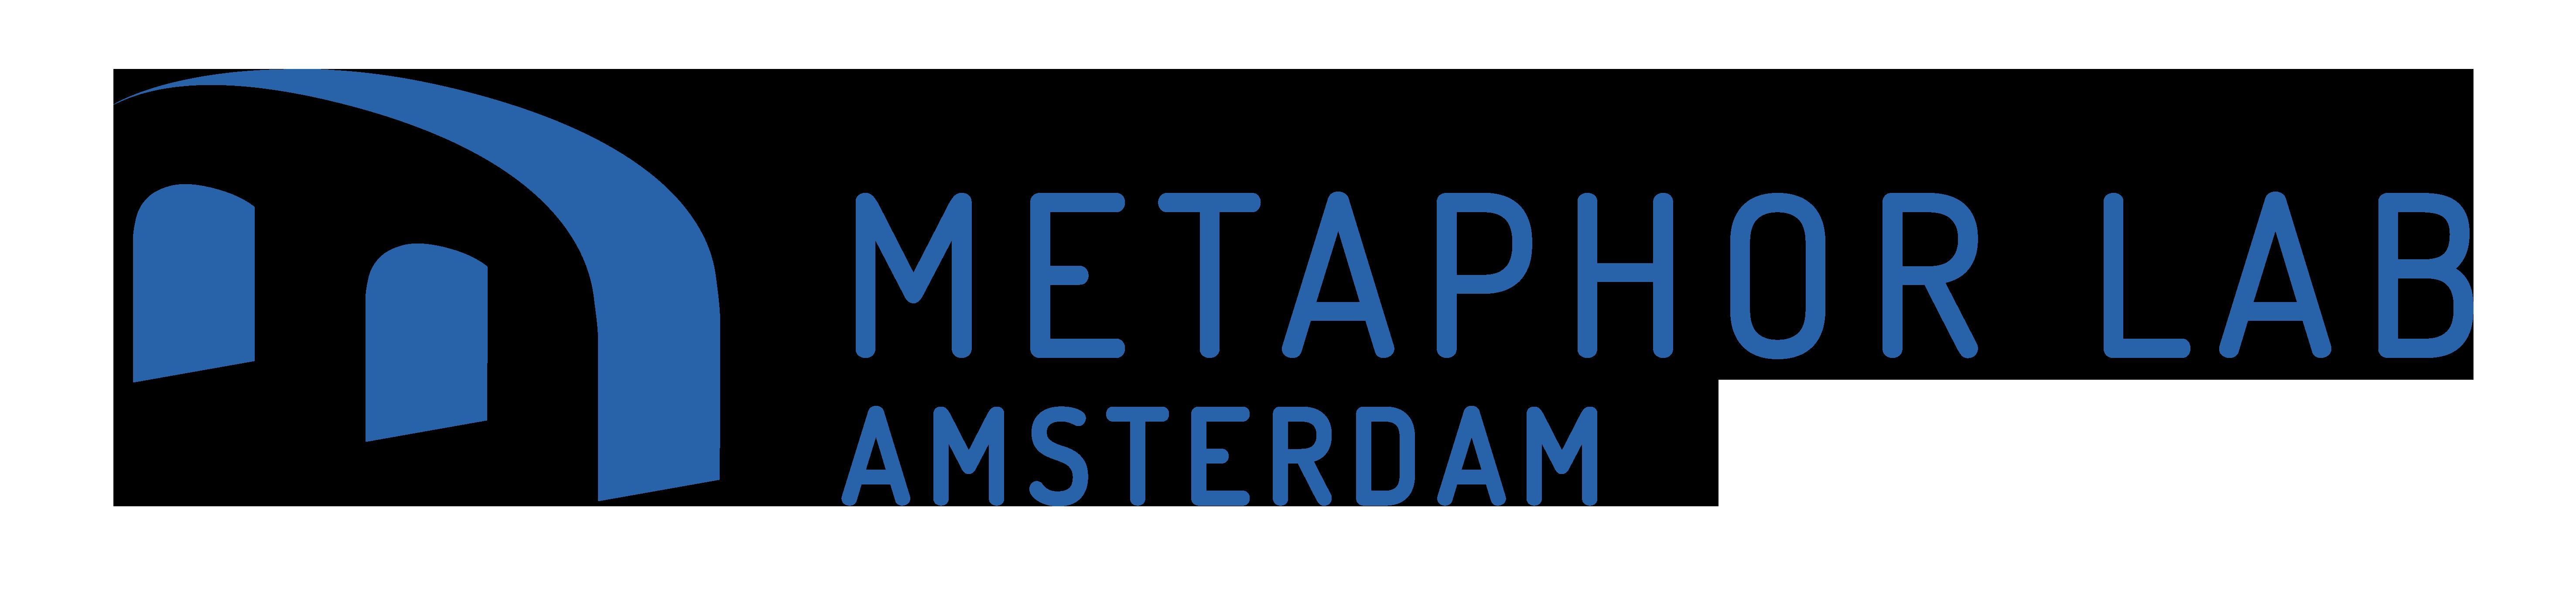 Metaphor Lab Amsterdam